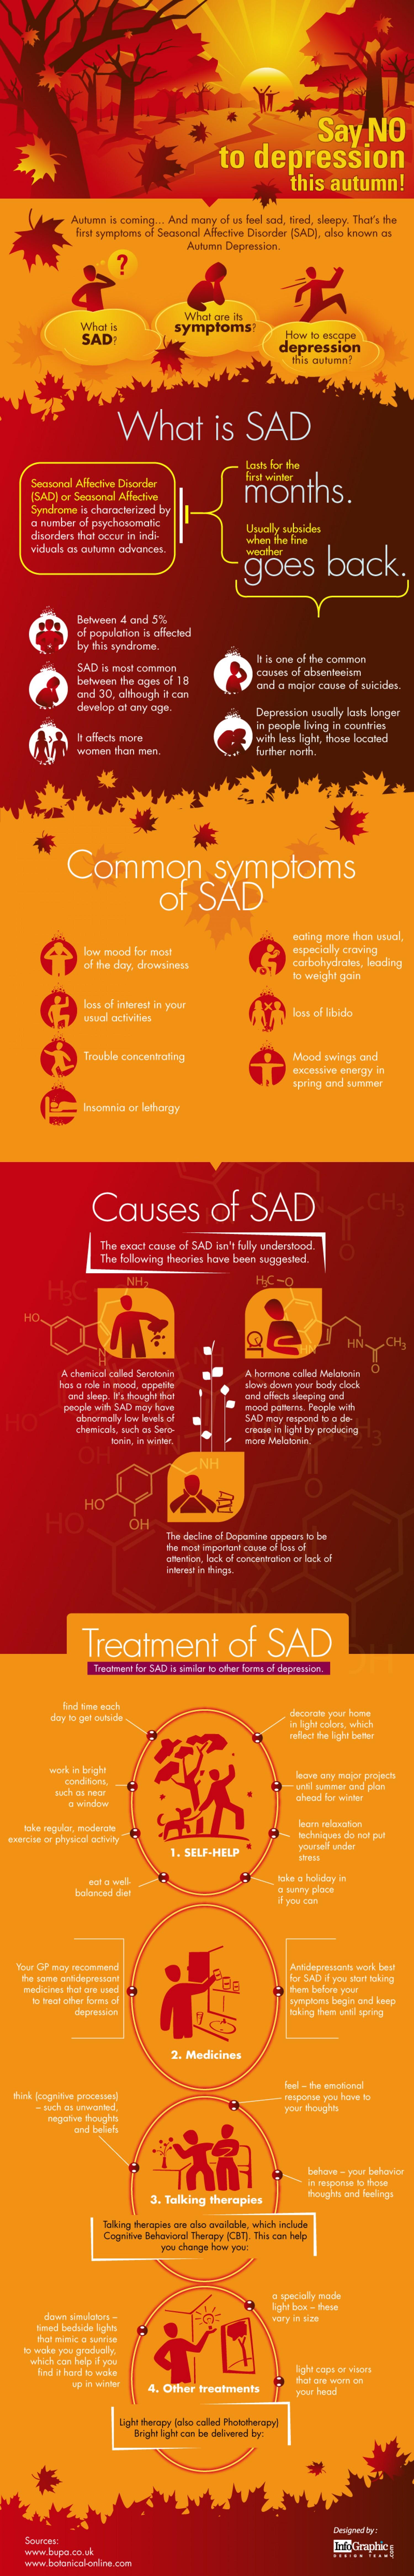 say-no-to-depression-this-autumn_528736bdc8c47_w1500